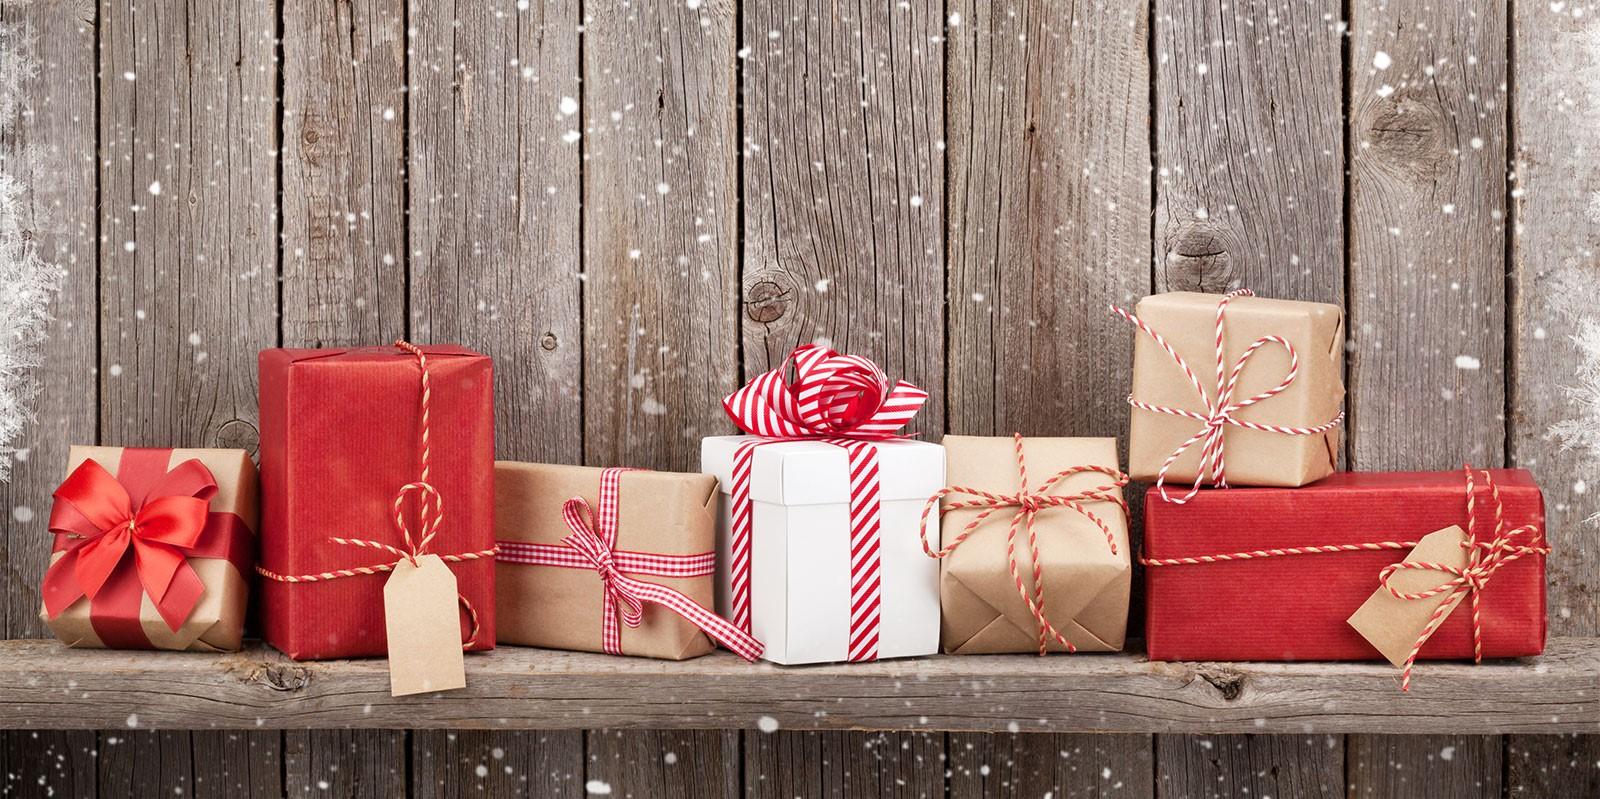 Emballage cadeau de Noël classique.